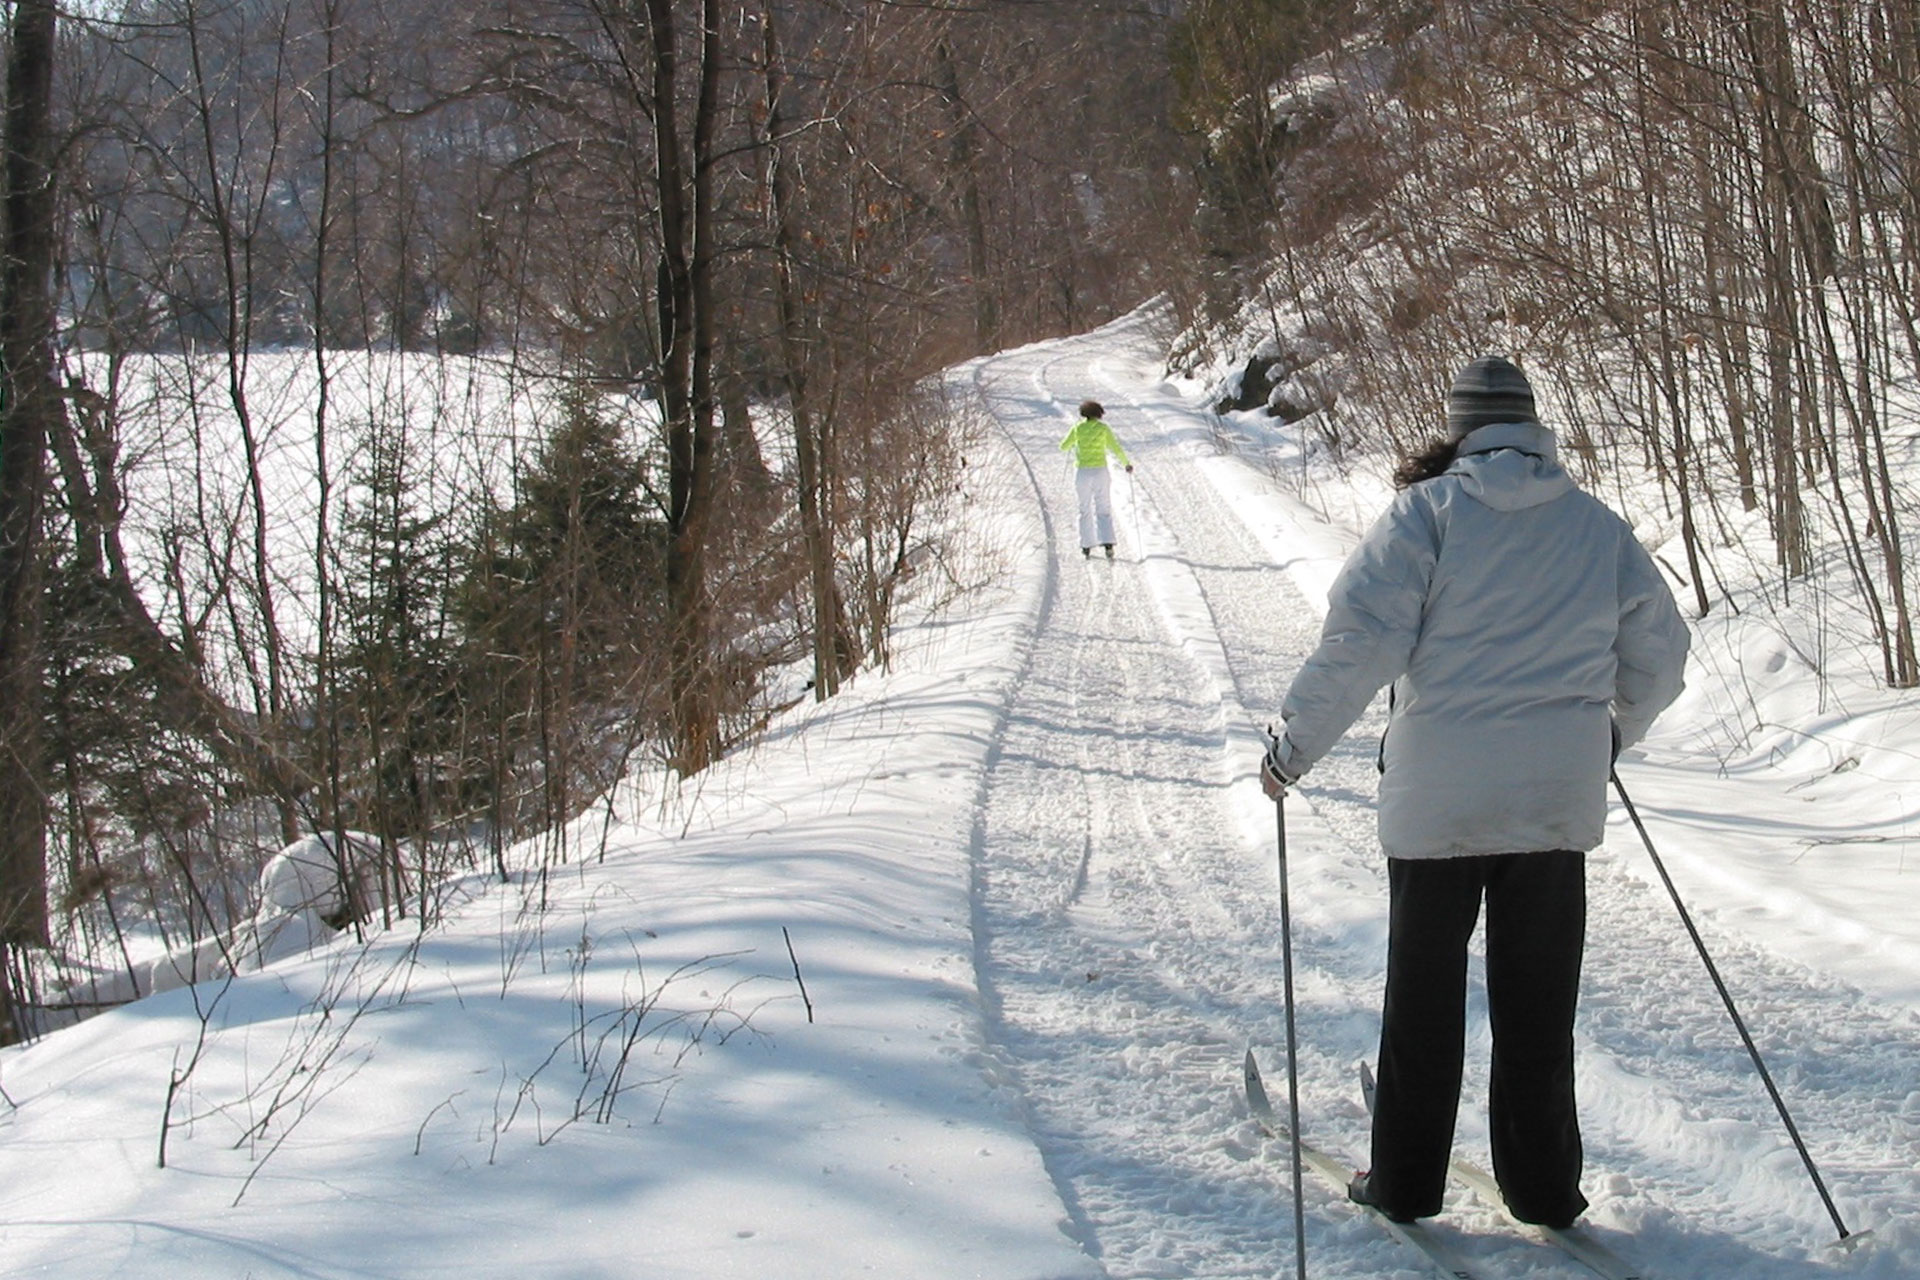 cross country skiier